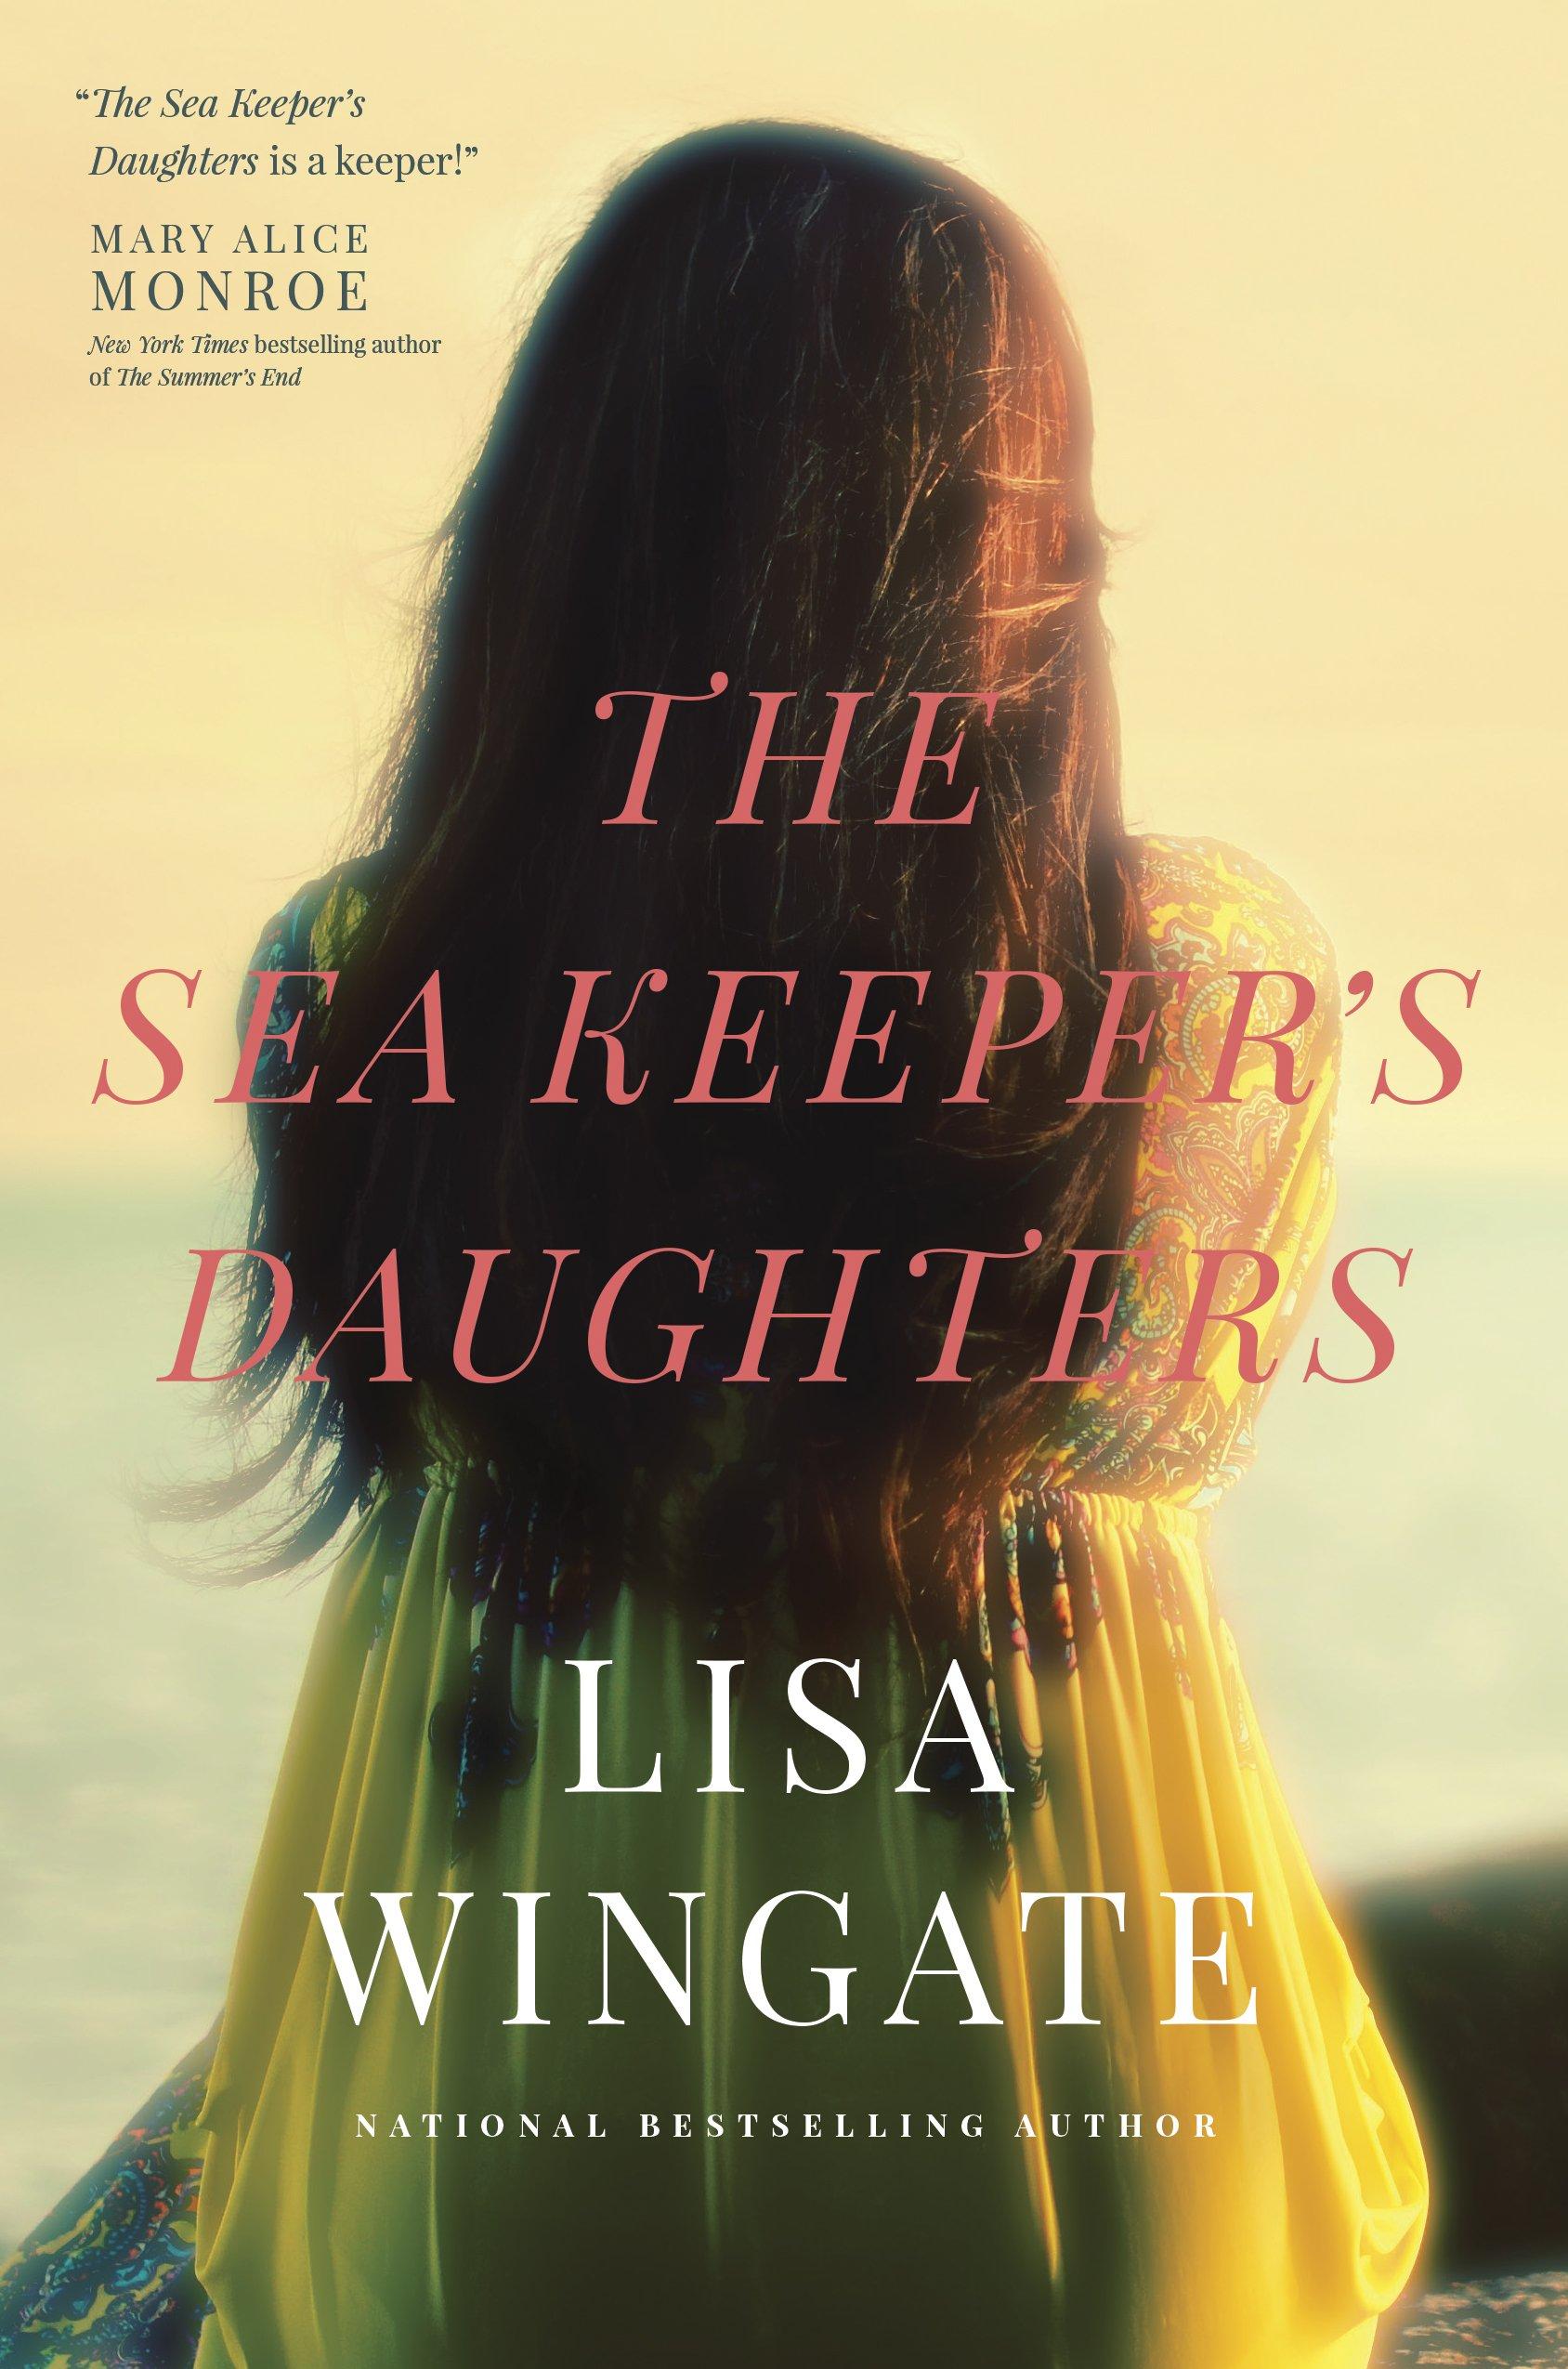 The Sea Keeper's Daughters (A Carolina Heirlooms Novel)